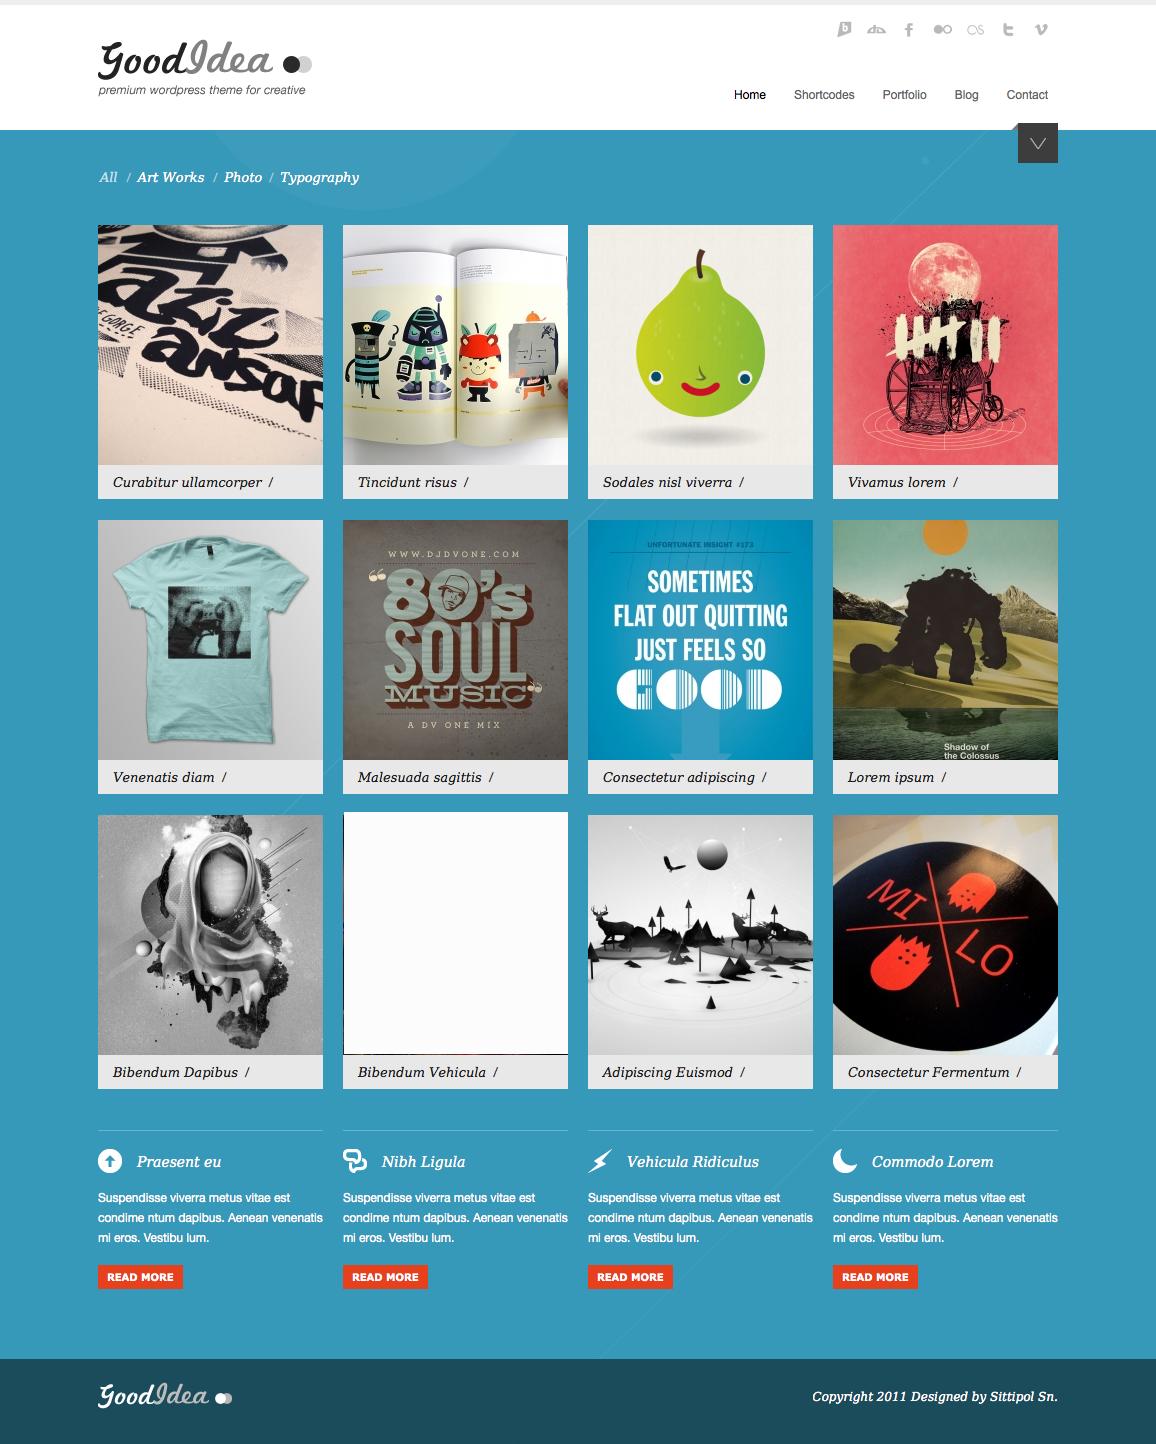 Goodidea - creative wordpress theme - homepage with blue